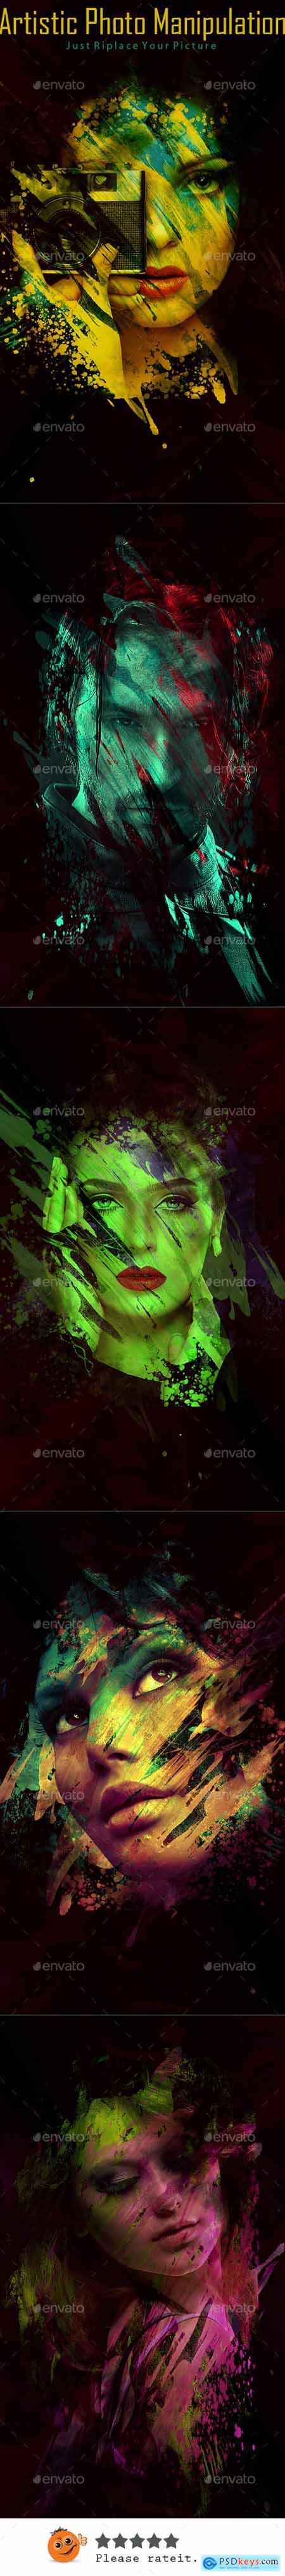 Artistic Photo Manipulation 23973247